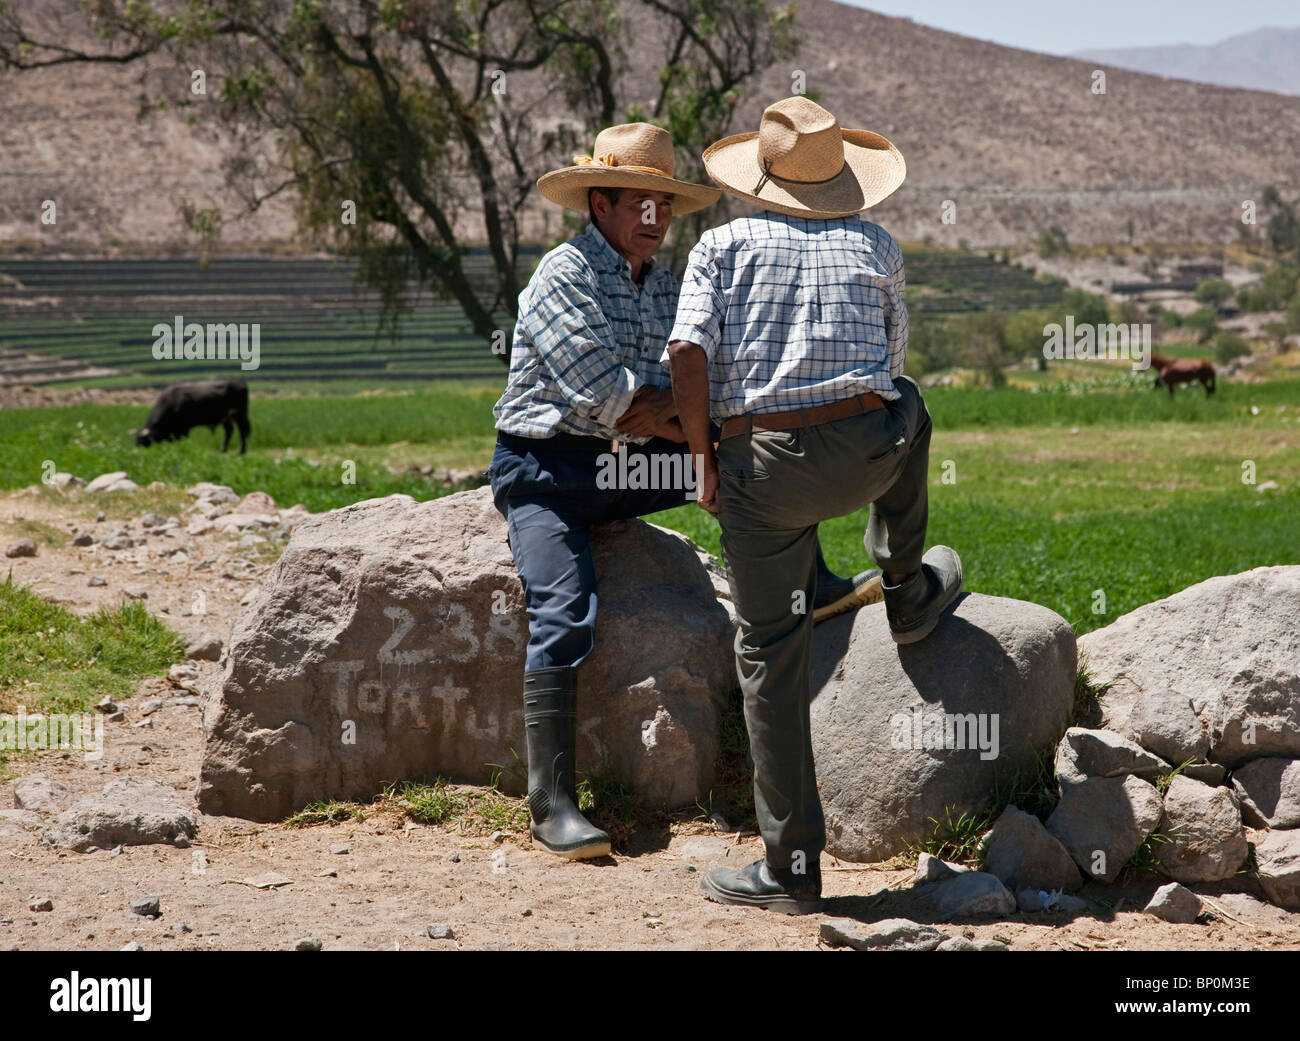 Inca Farmer Immagini   Inca Farmer Fotos Stock - Alamy 53eb61087824